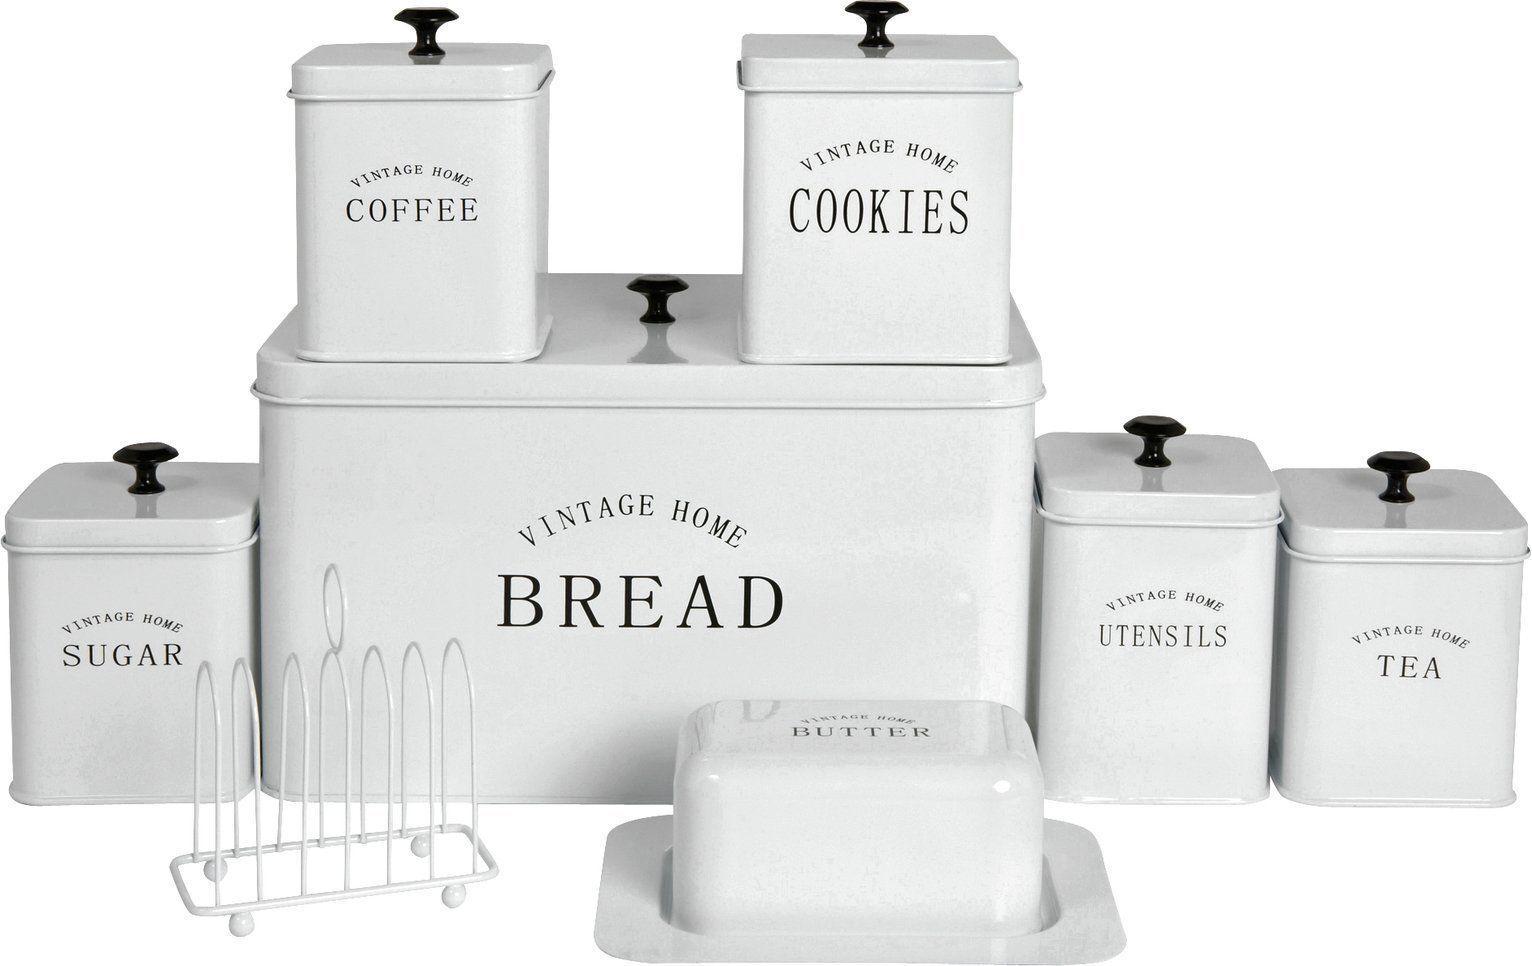 8Pc Bread Cookies Utensils Tea Sugar Coffee Coffee Coffee Butter Storage Jar Canister Tin Set 38de97